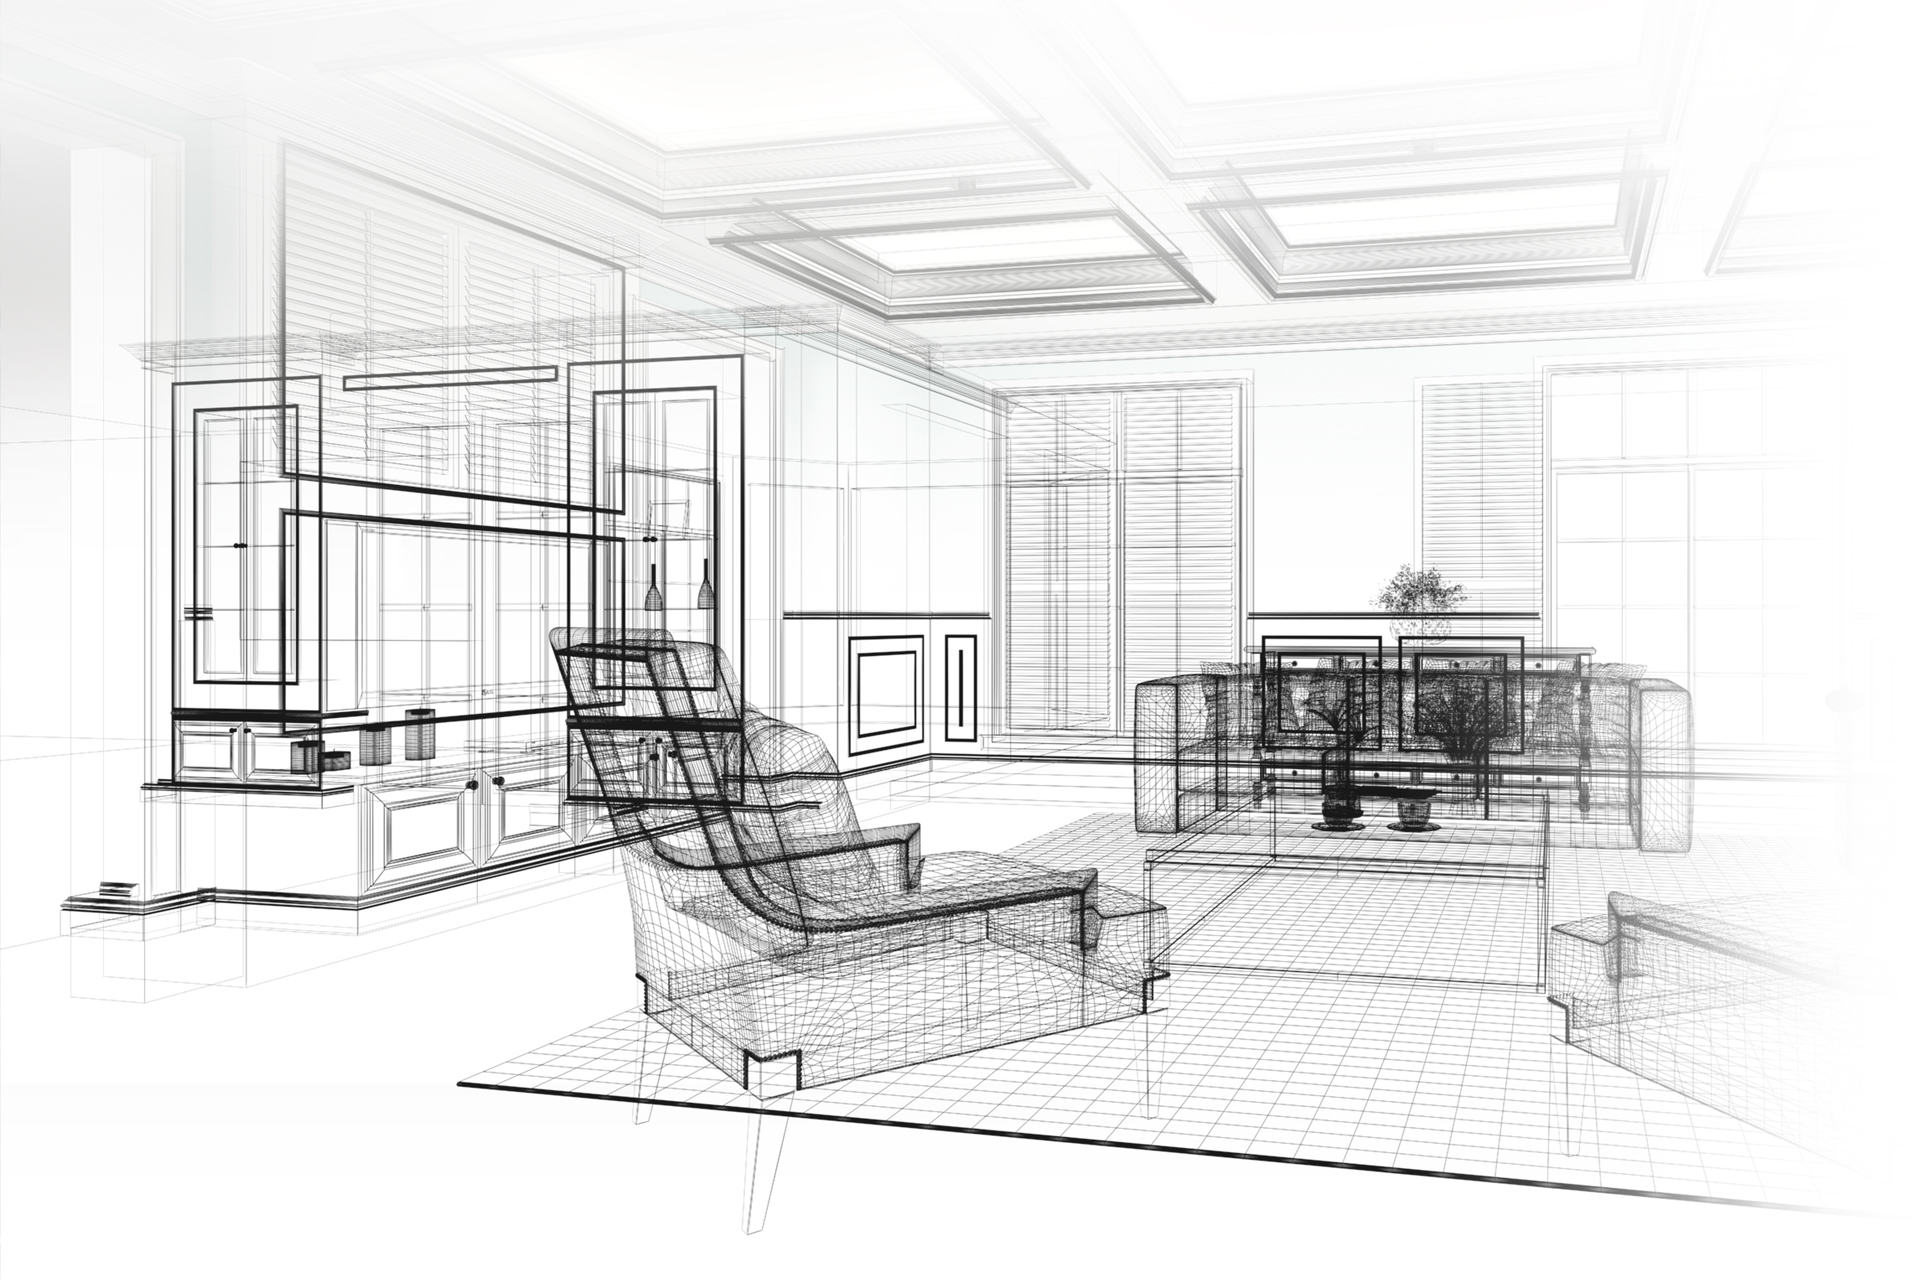 3d wandpaneele - design ideen - inspiration - deckenpaneele - 3d, Hause deko